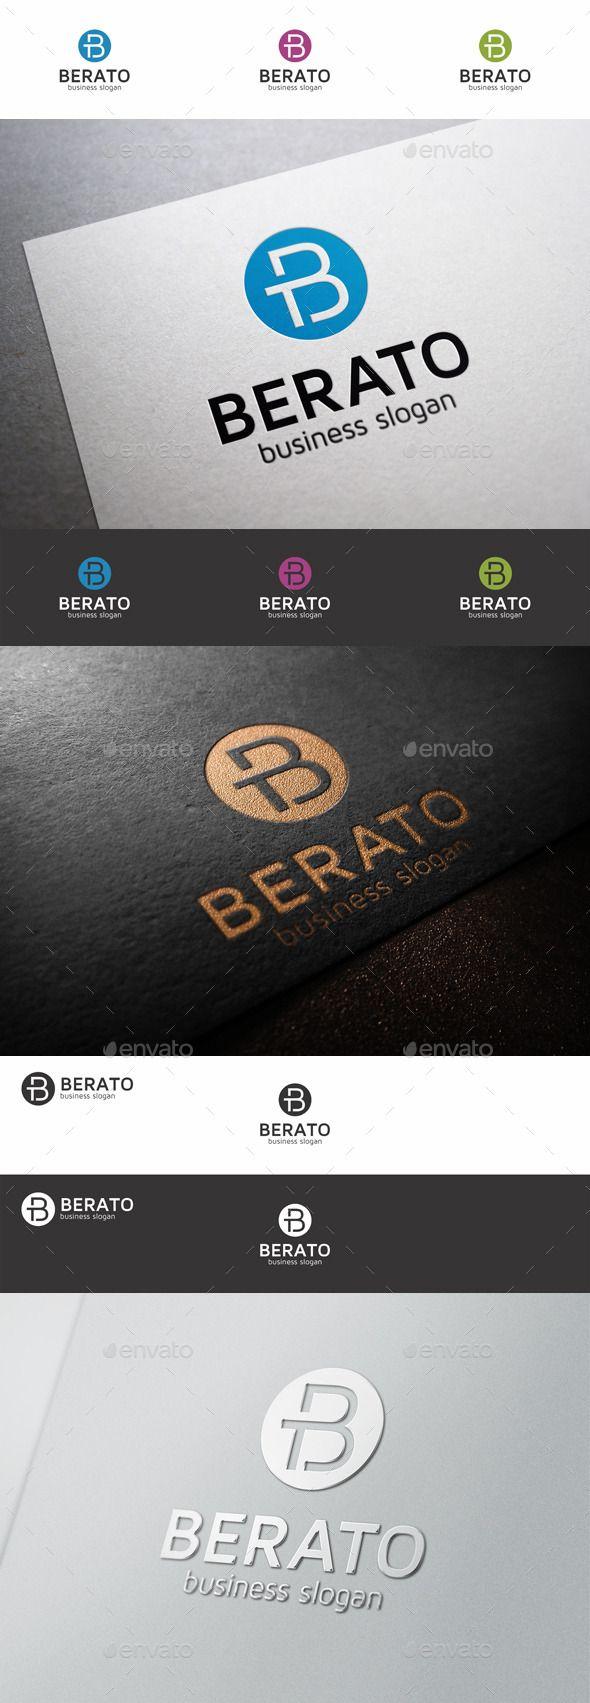 B Letter Berato TB - Logo Design Template Vector #logotype Download it here: http://graphicriver.net/item/b-letter-logo-berato-tb/9228146?s_rank=481?ref=nesto